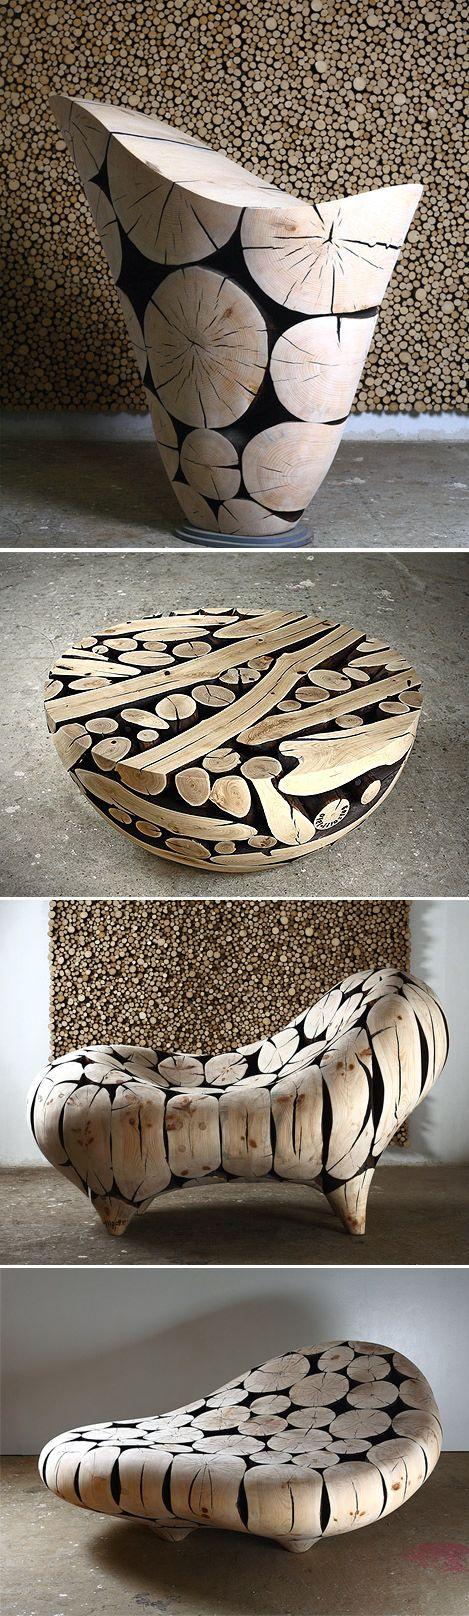 Amazing sculptures by Jae Hyo Lee